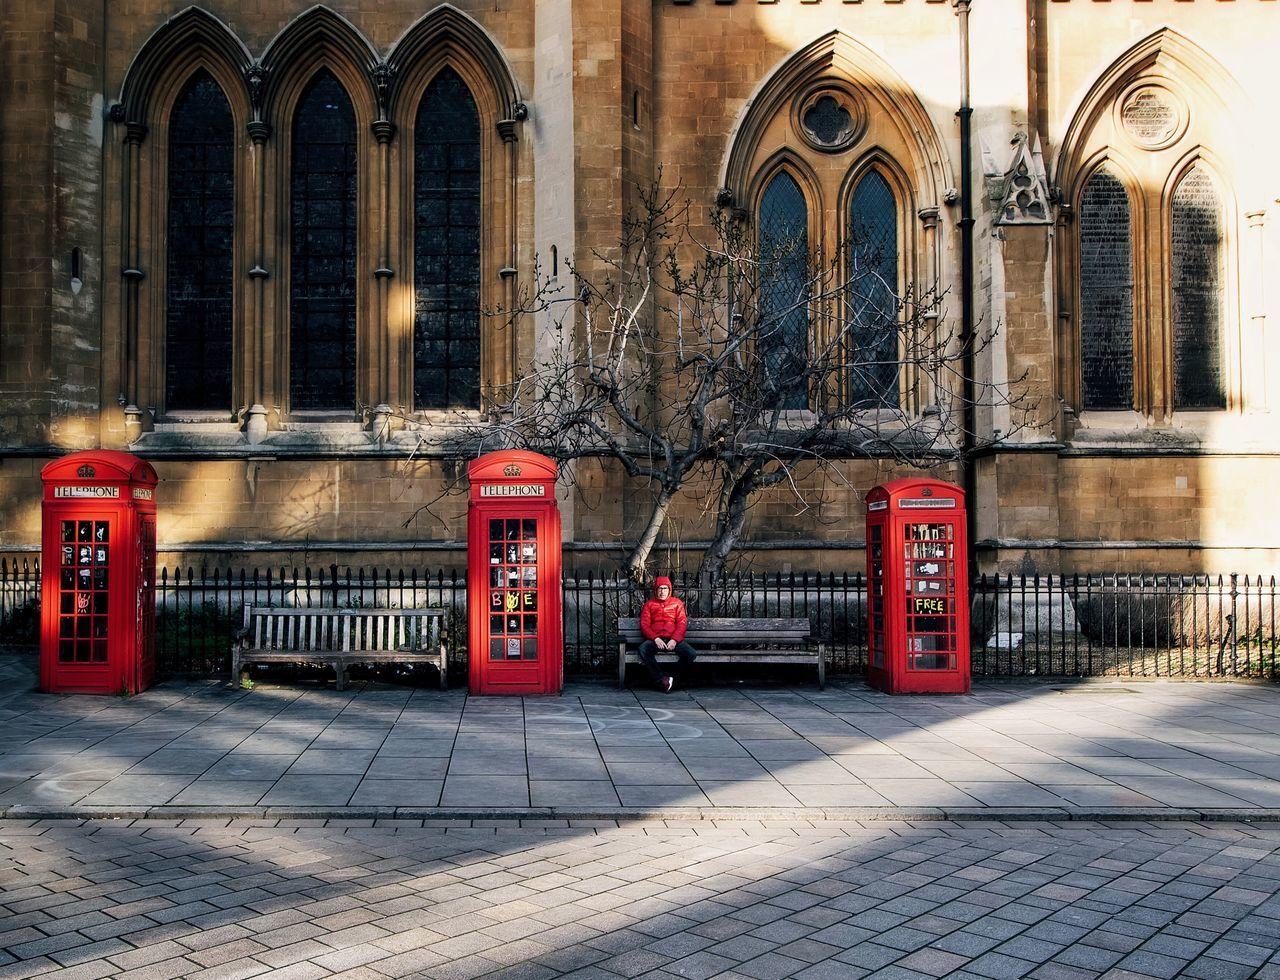 Man sitting on bench in city